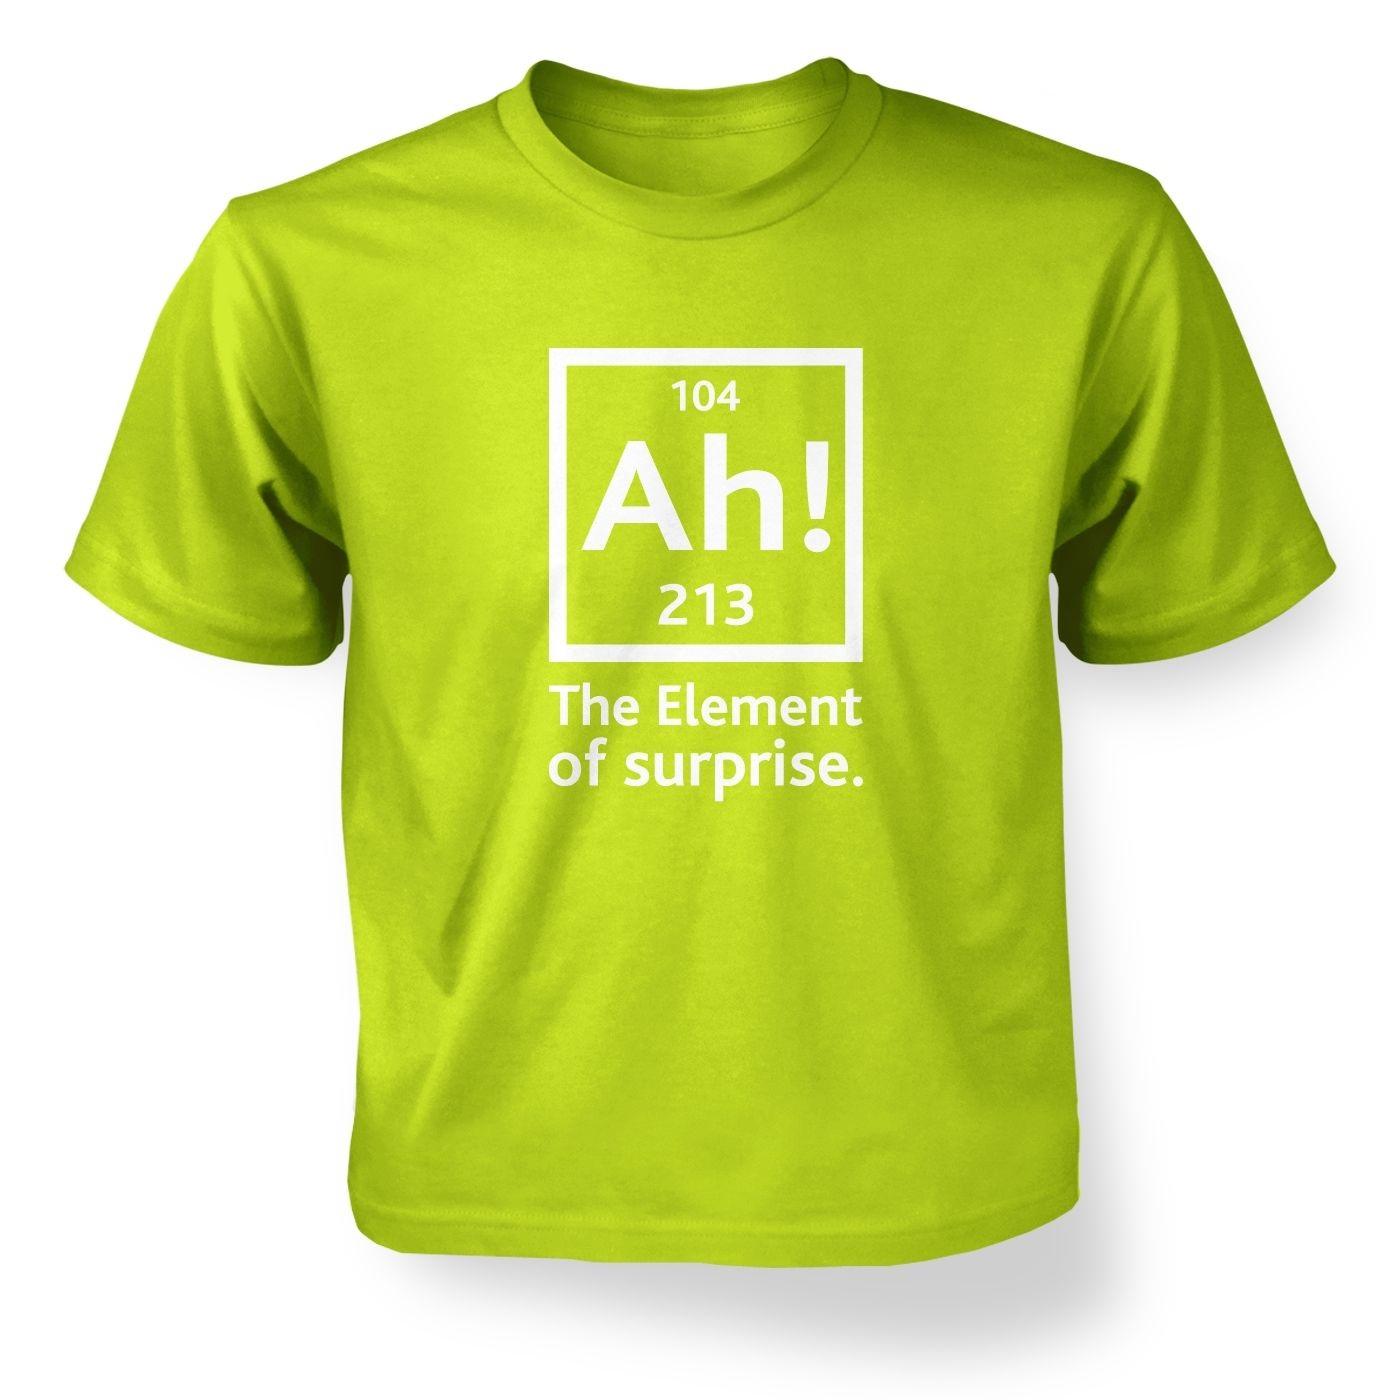 Ah! The Element Of Surprise kids' t-shirt